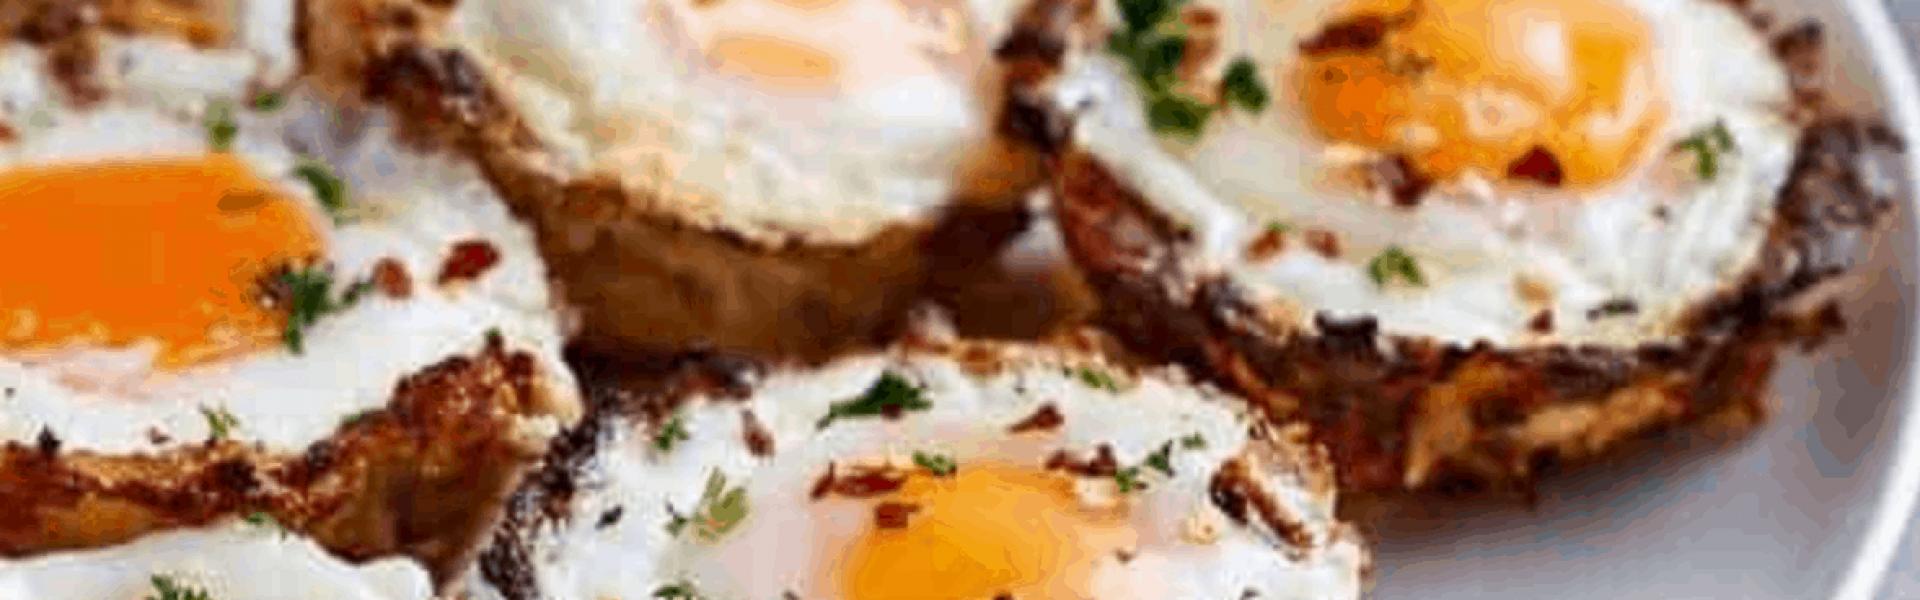 cauliflower hash brown egg